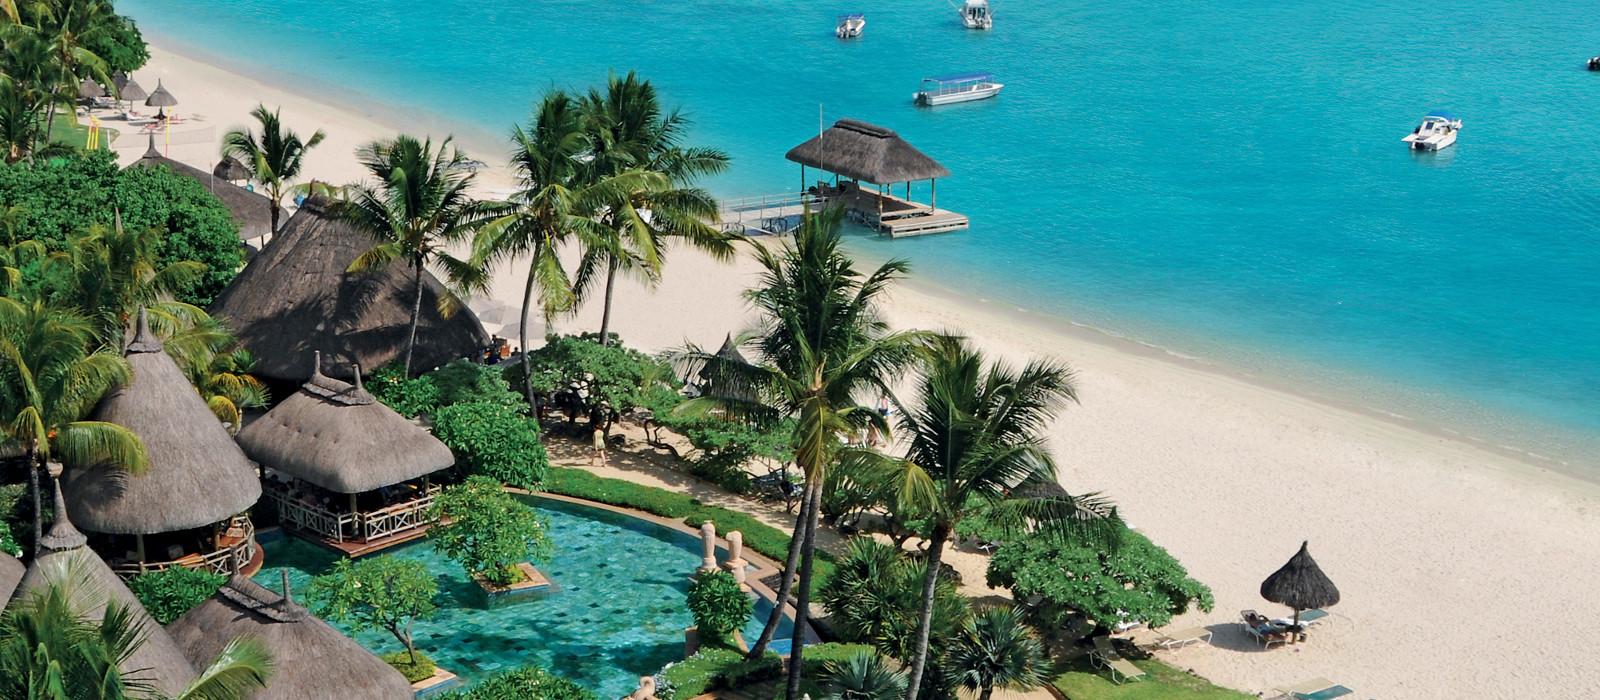 Hotel La Pirogue Resort & Spa Mauritius